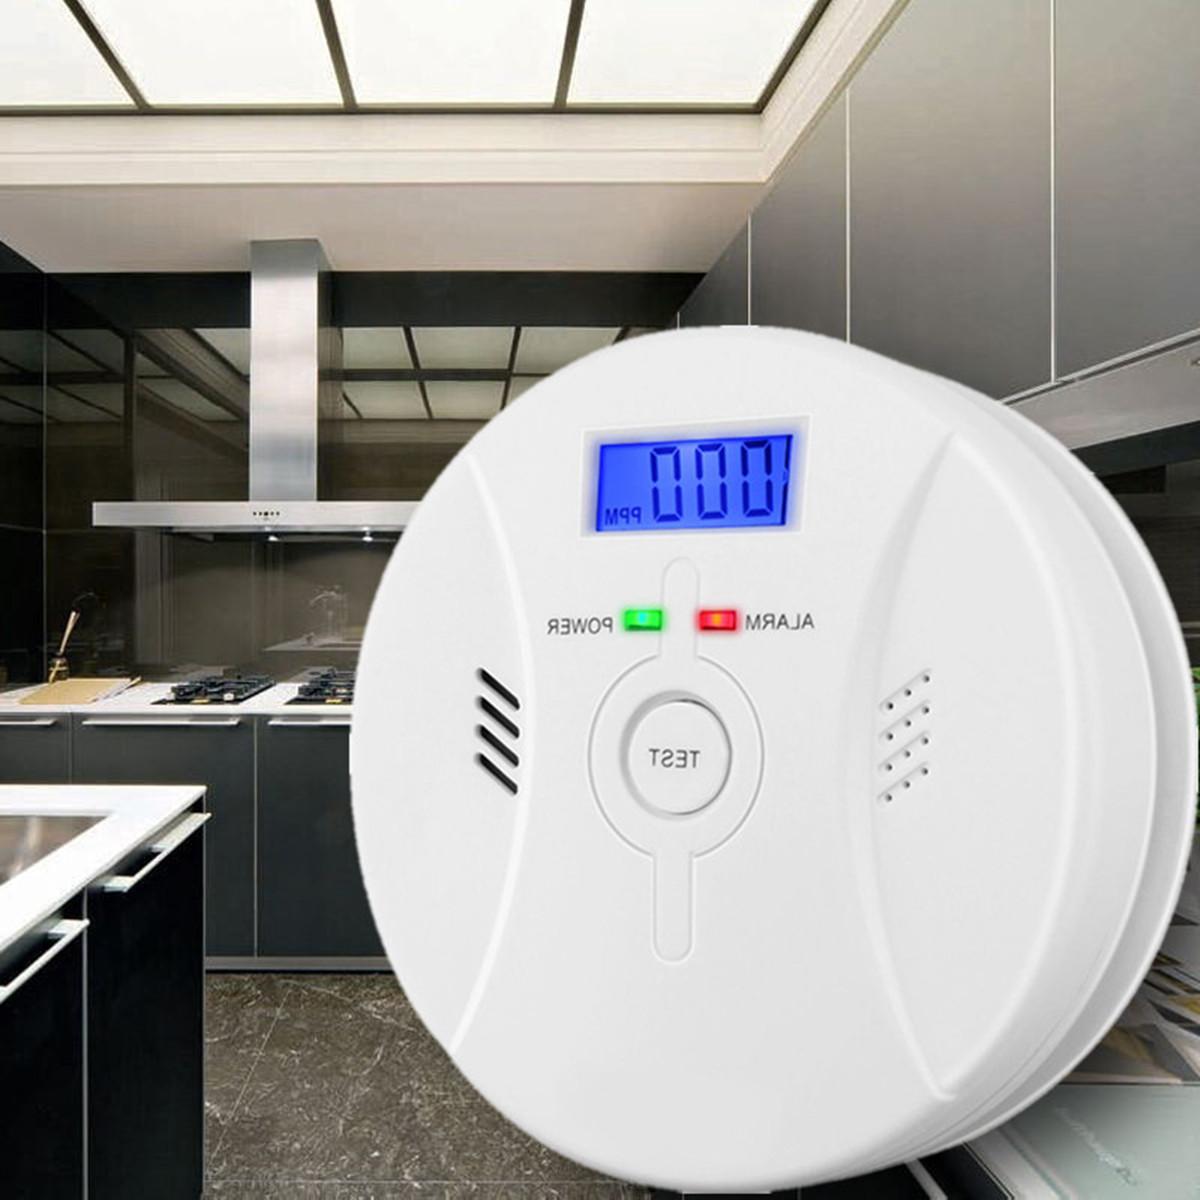 CO Carbon Monoxide Detector Poisoning Smoke Fire Security Alarm Warning Sensor